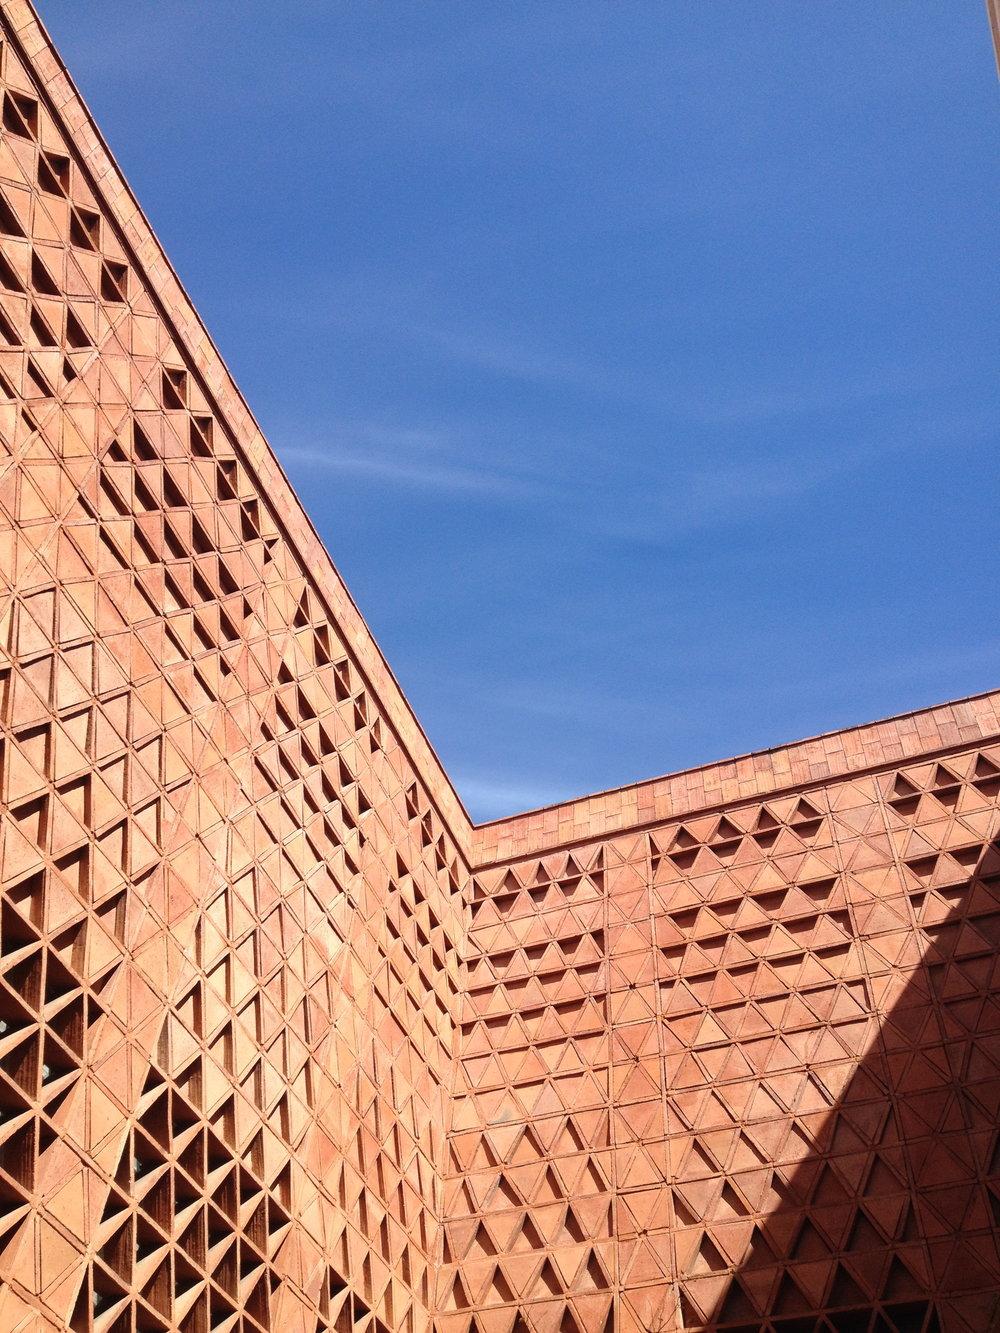 oaxaca architecture